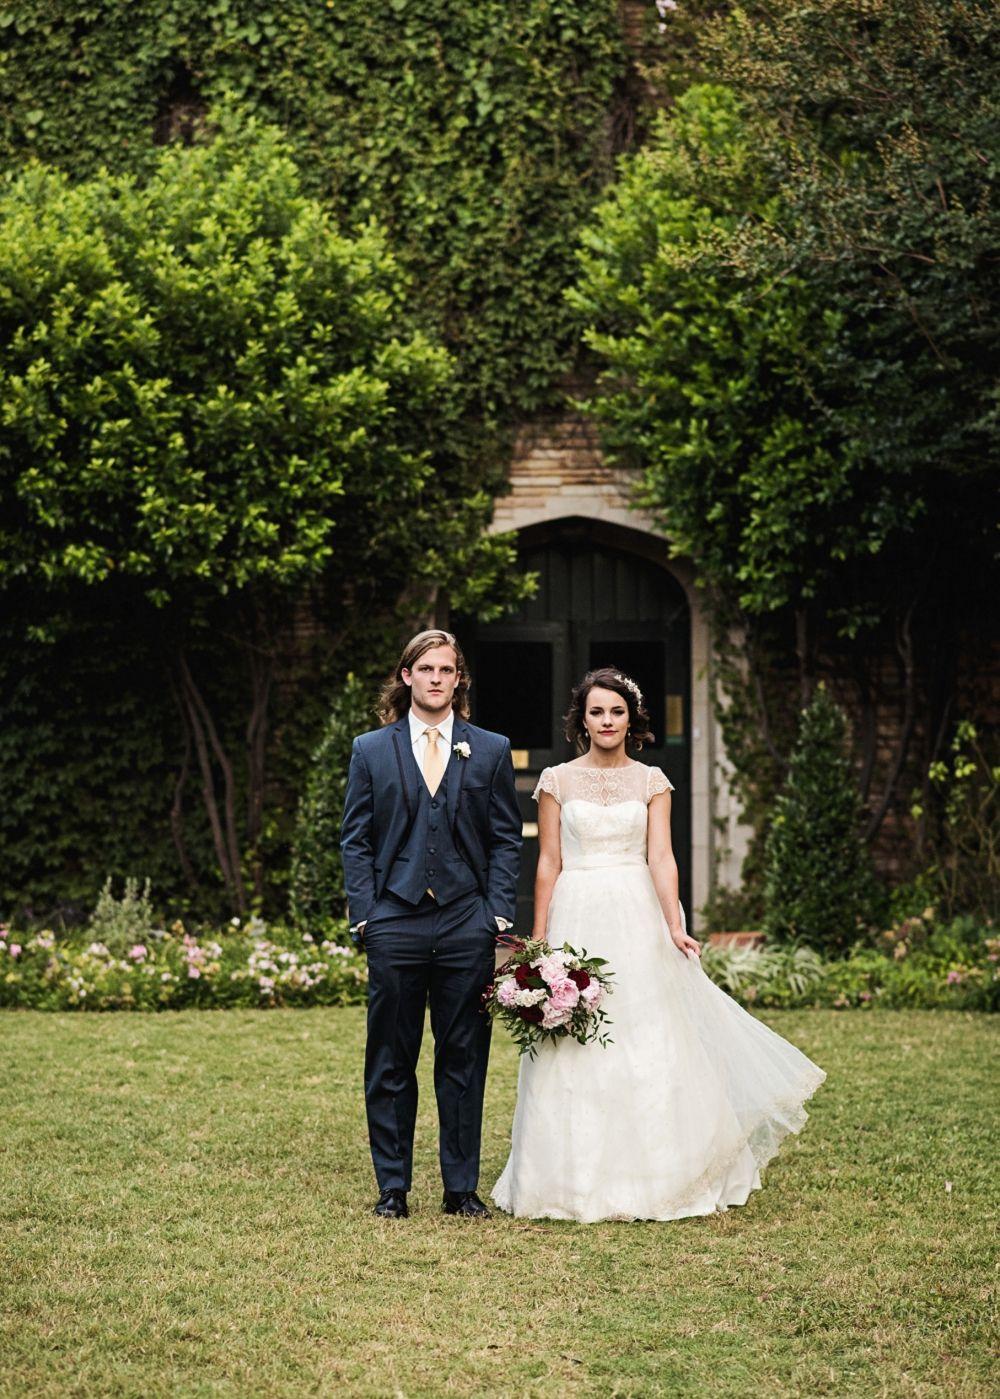 Fort Worth Wedding - The Rose Chapel & Marty Leonard - Wedding Photography by Miranda Marrs Photography